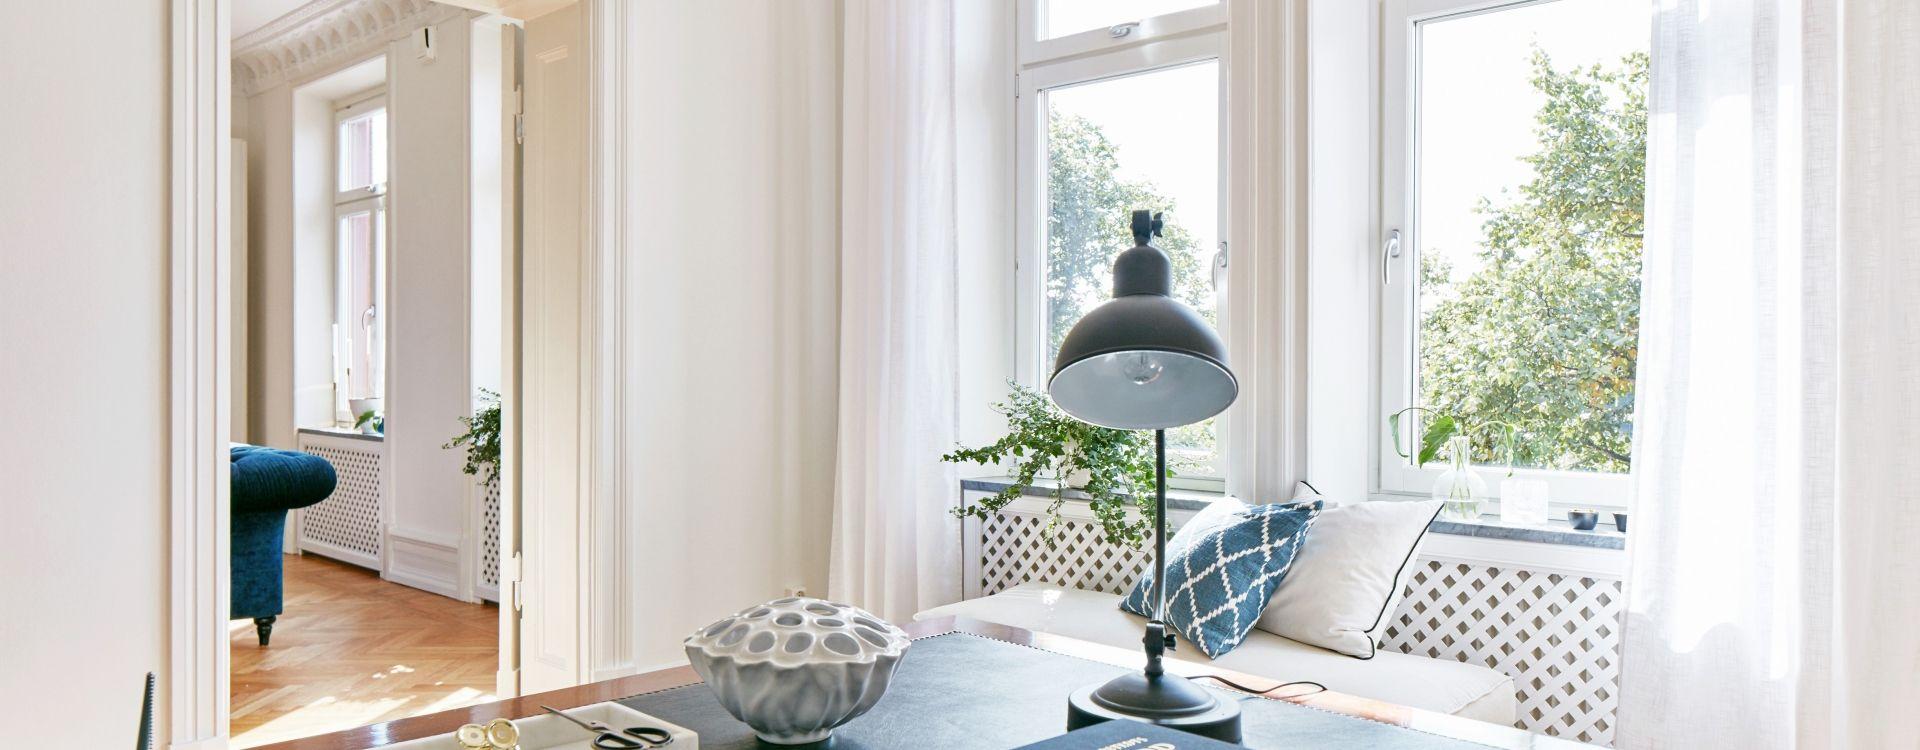 Inredning elementskydd : Fina elementskydd   Vardagsrum   Pinterest   Inredning and Modern